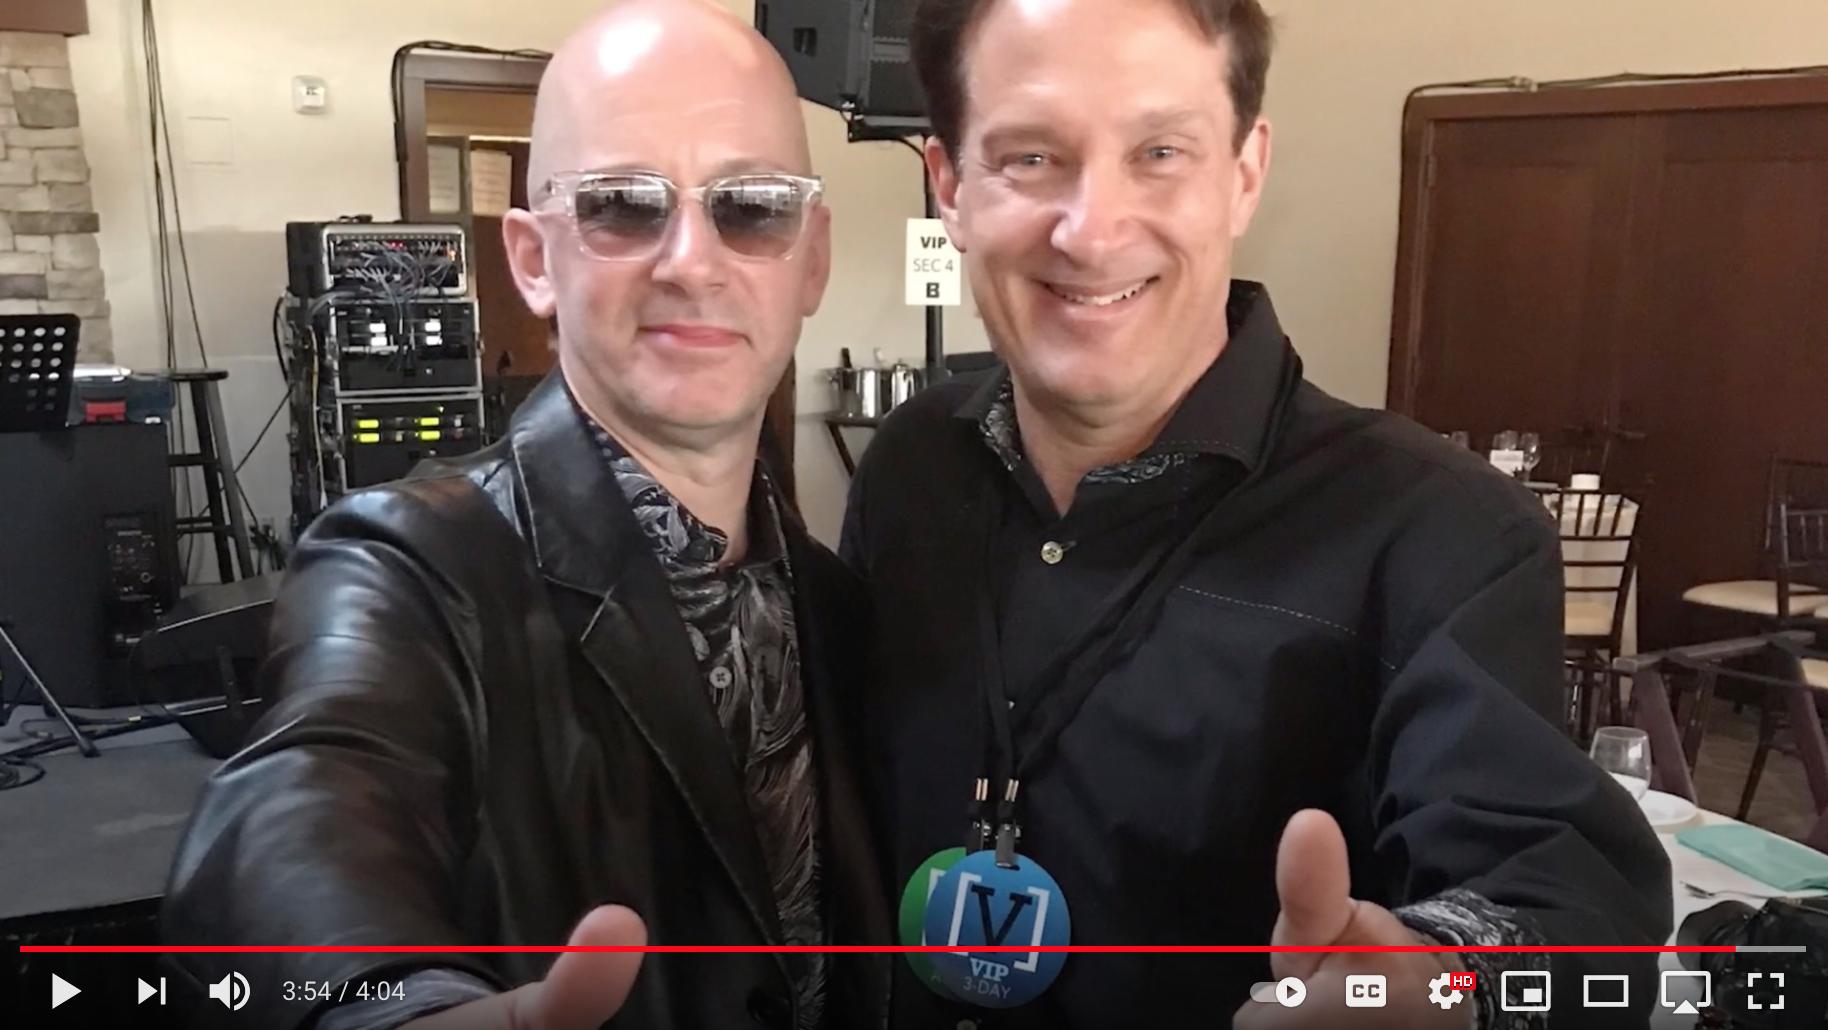 Wayne Gutshall Video